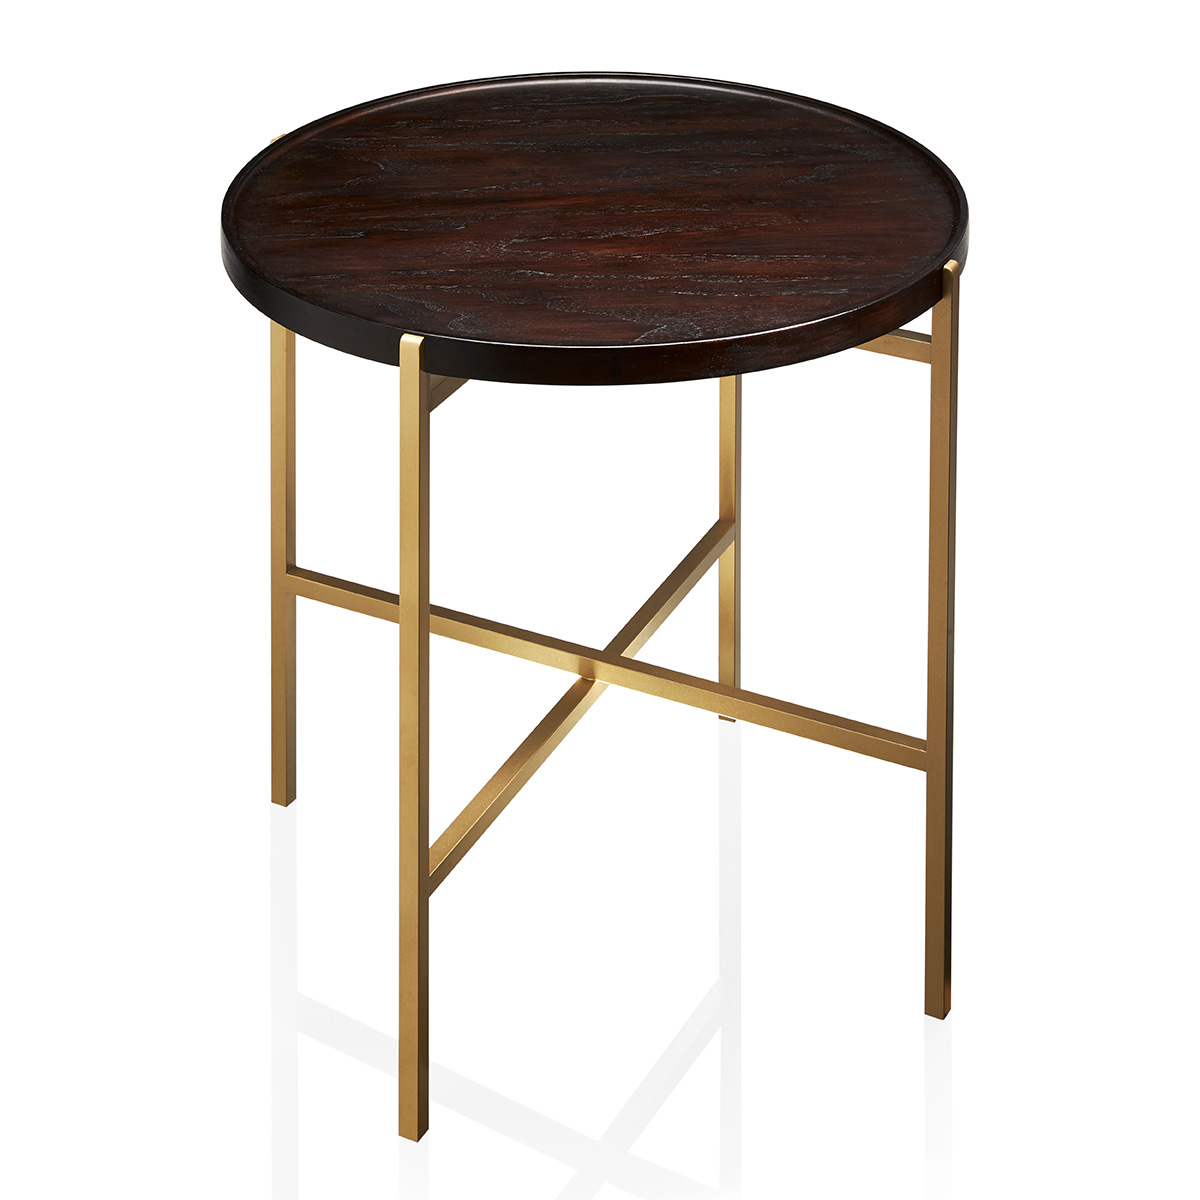 Table_Black-Wood_1.jpg